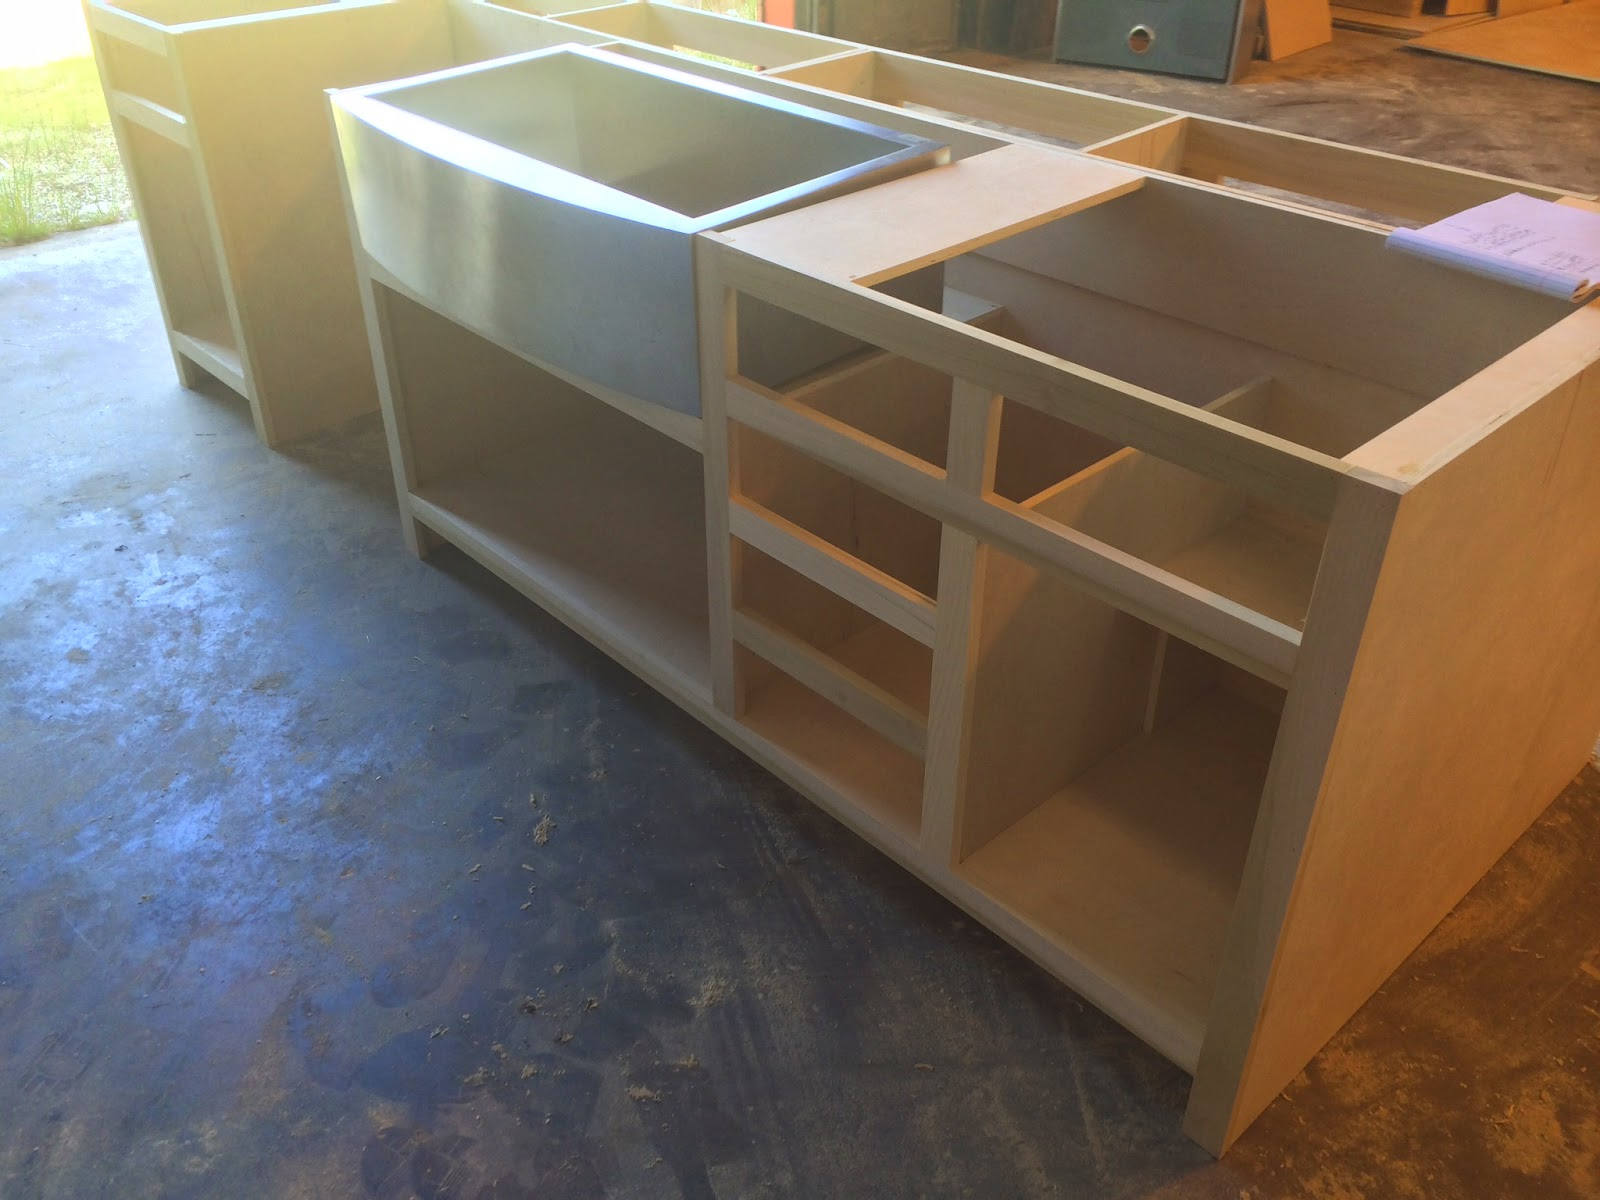 jenson crew j crew kitchen cabinets boxes cut out